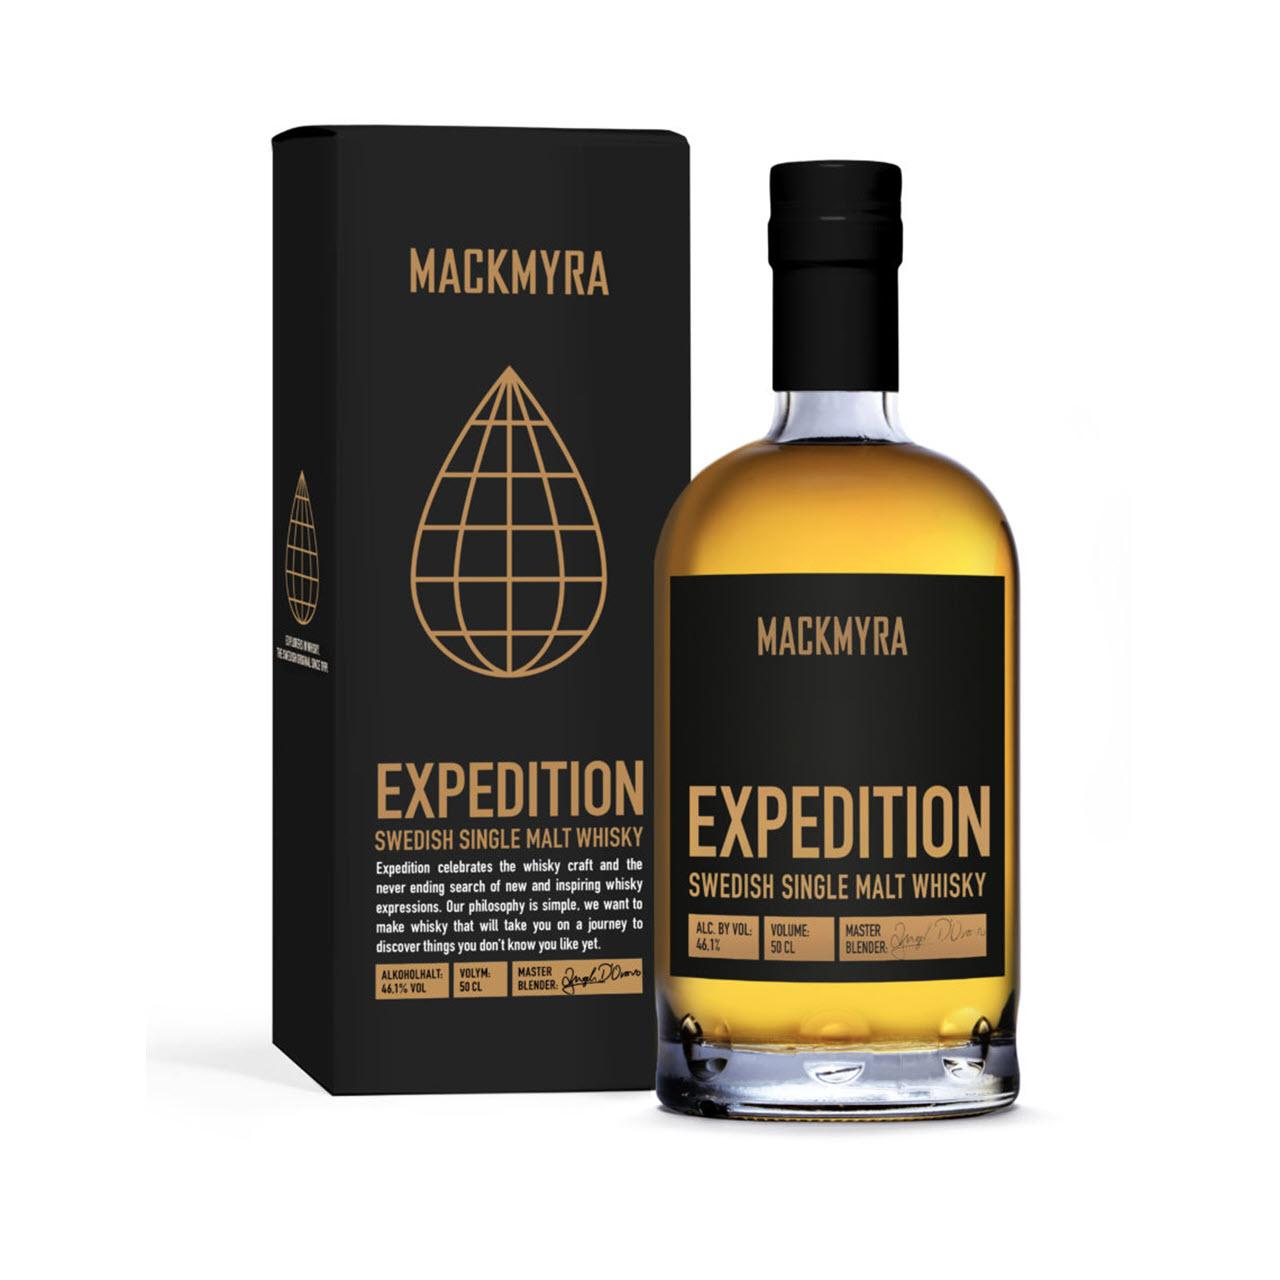 Nordic whisky #188 - Mackmyra Expedition